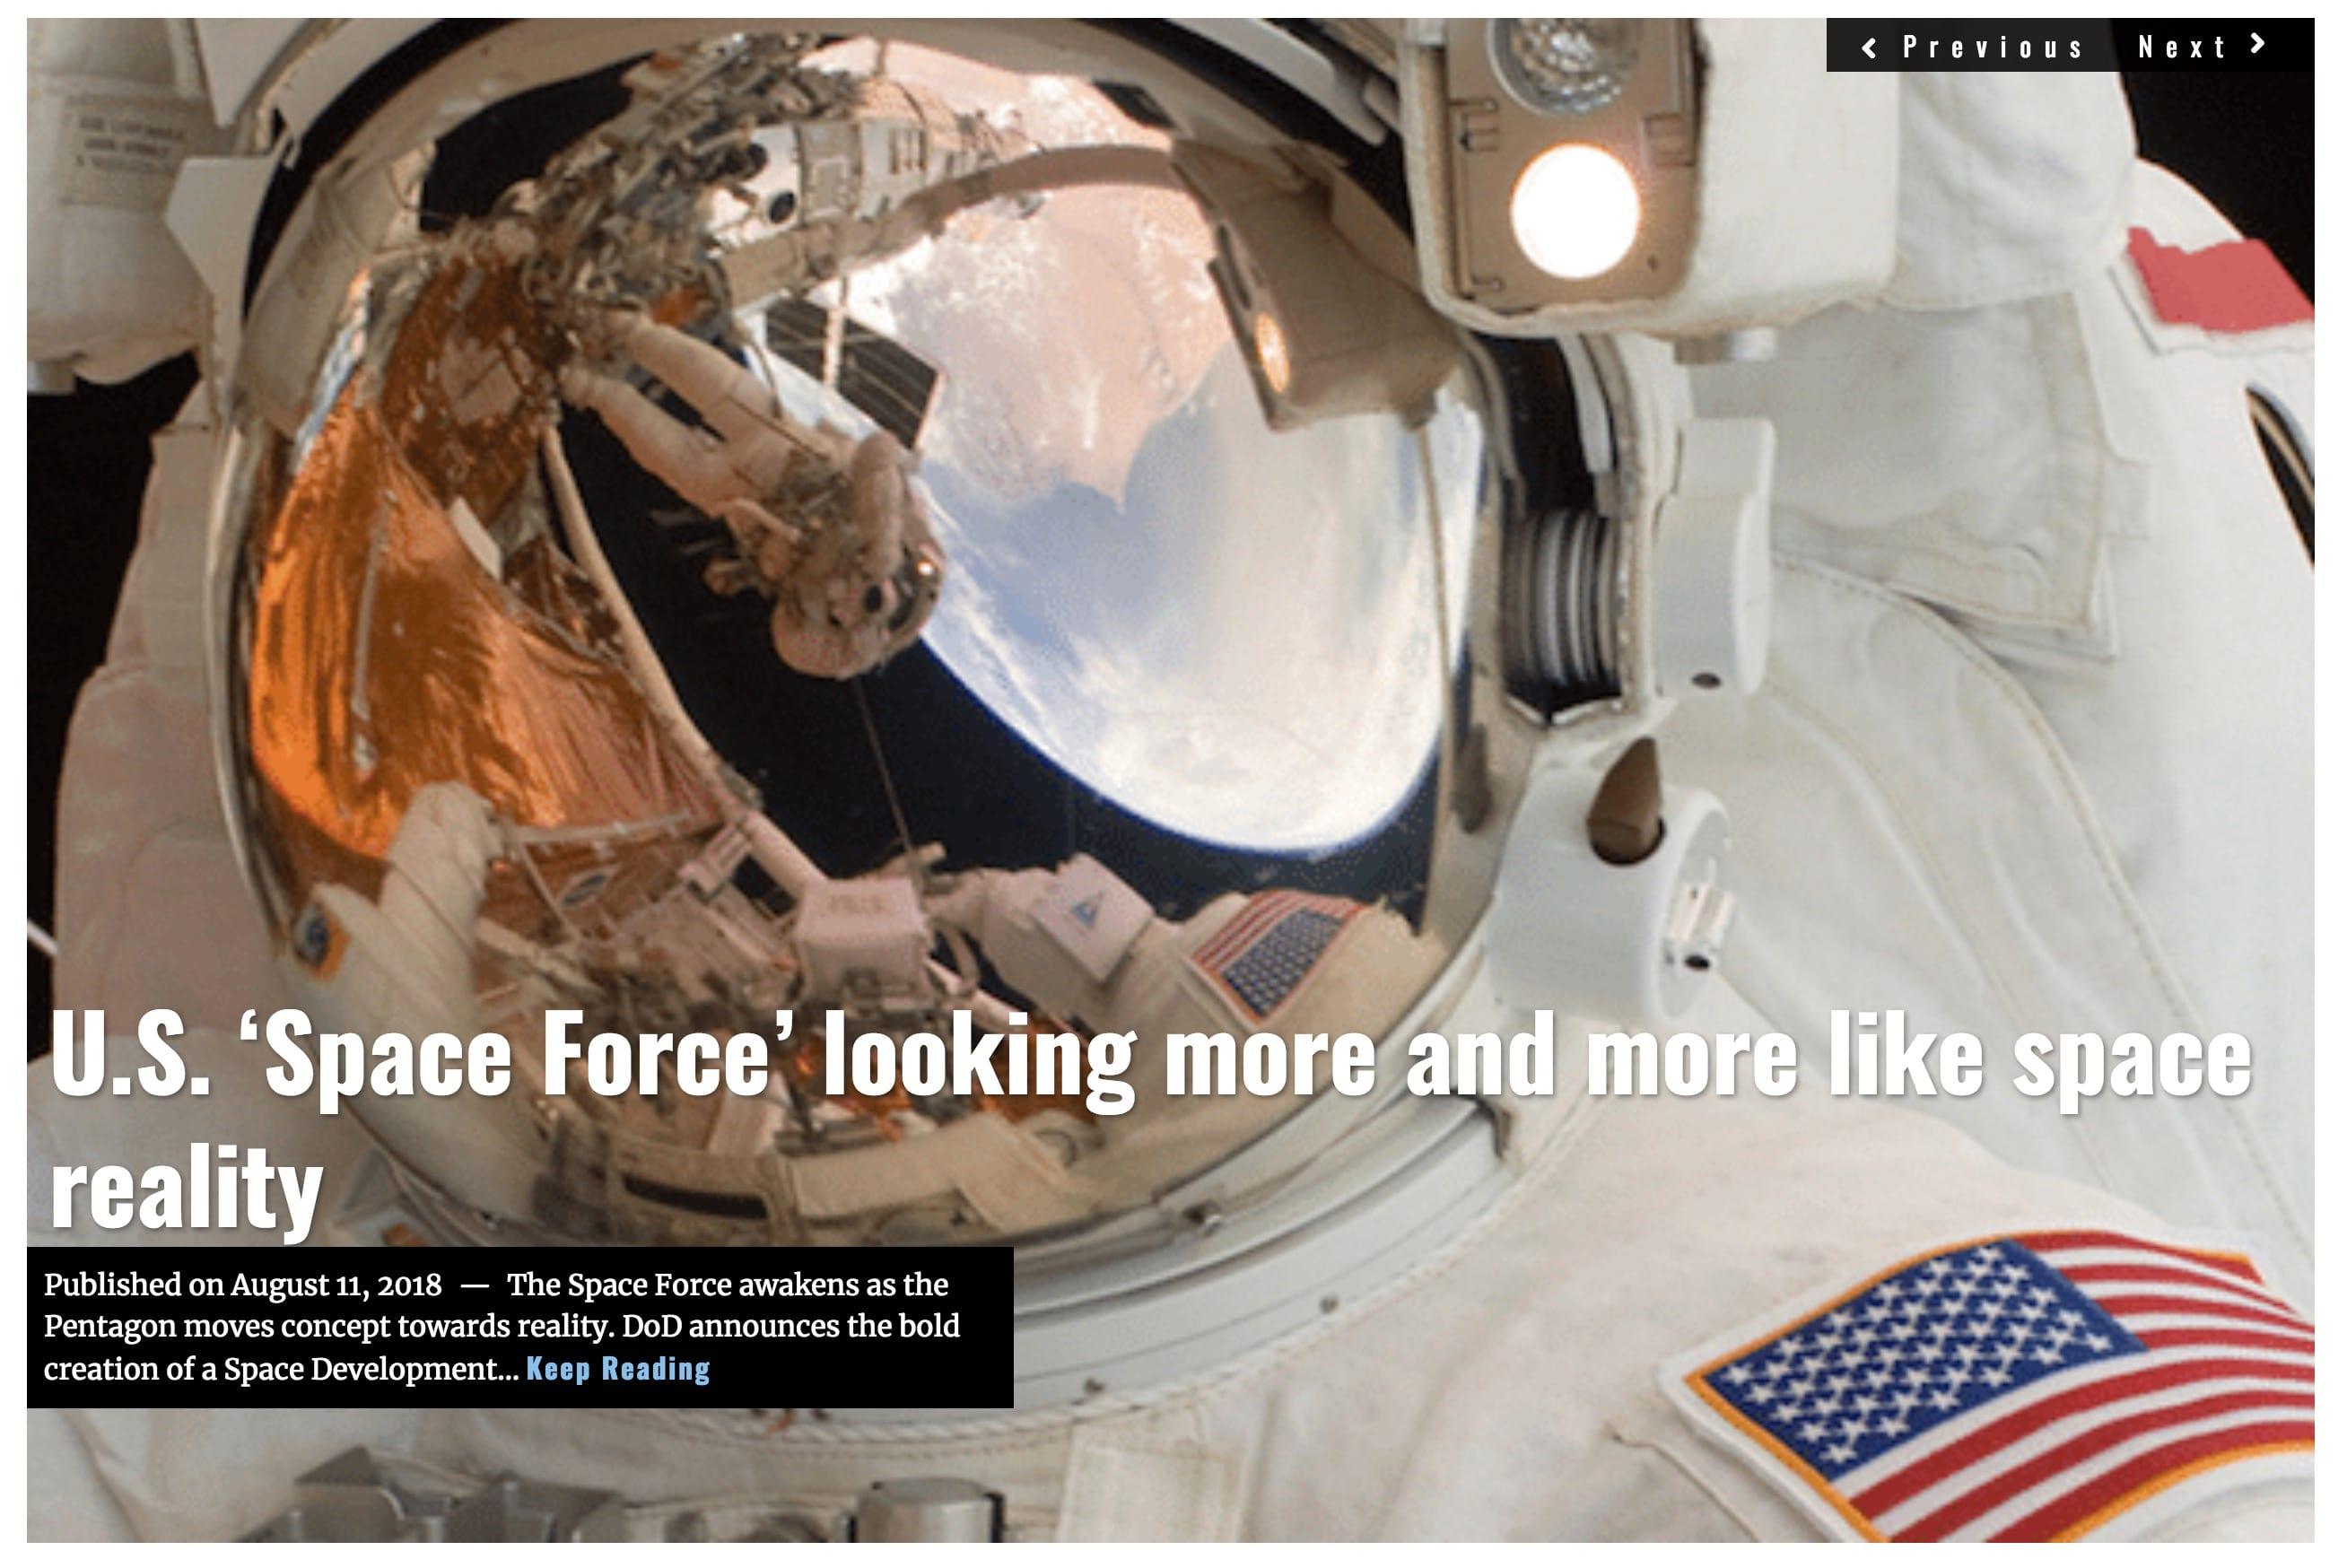 Image Lima Charlie News Headline Space Force M.Korzen AUG 10 2018